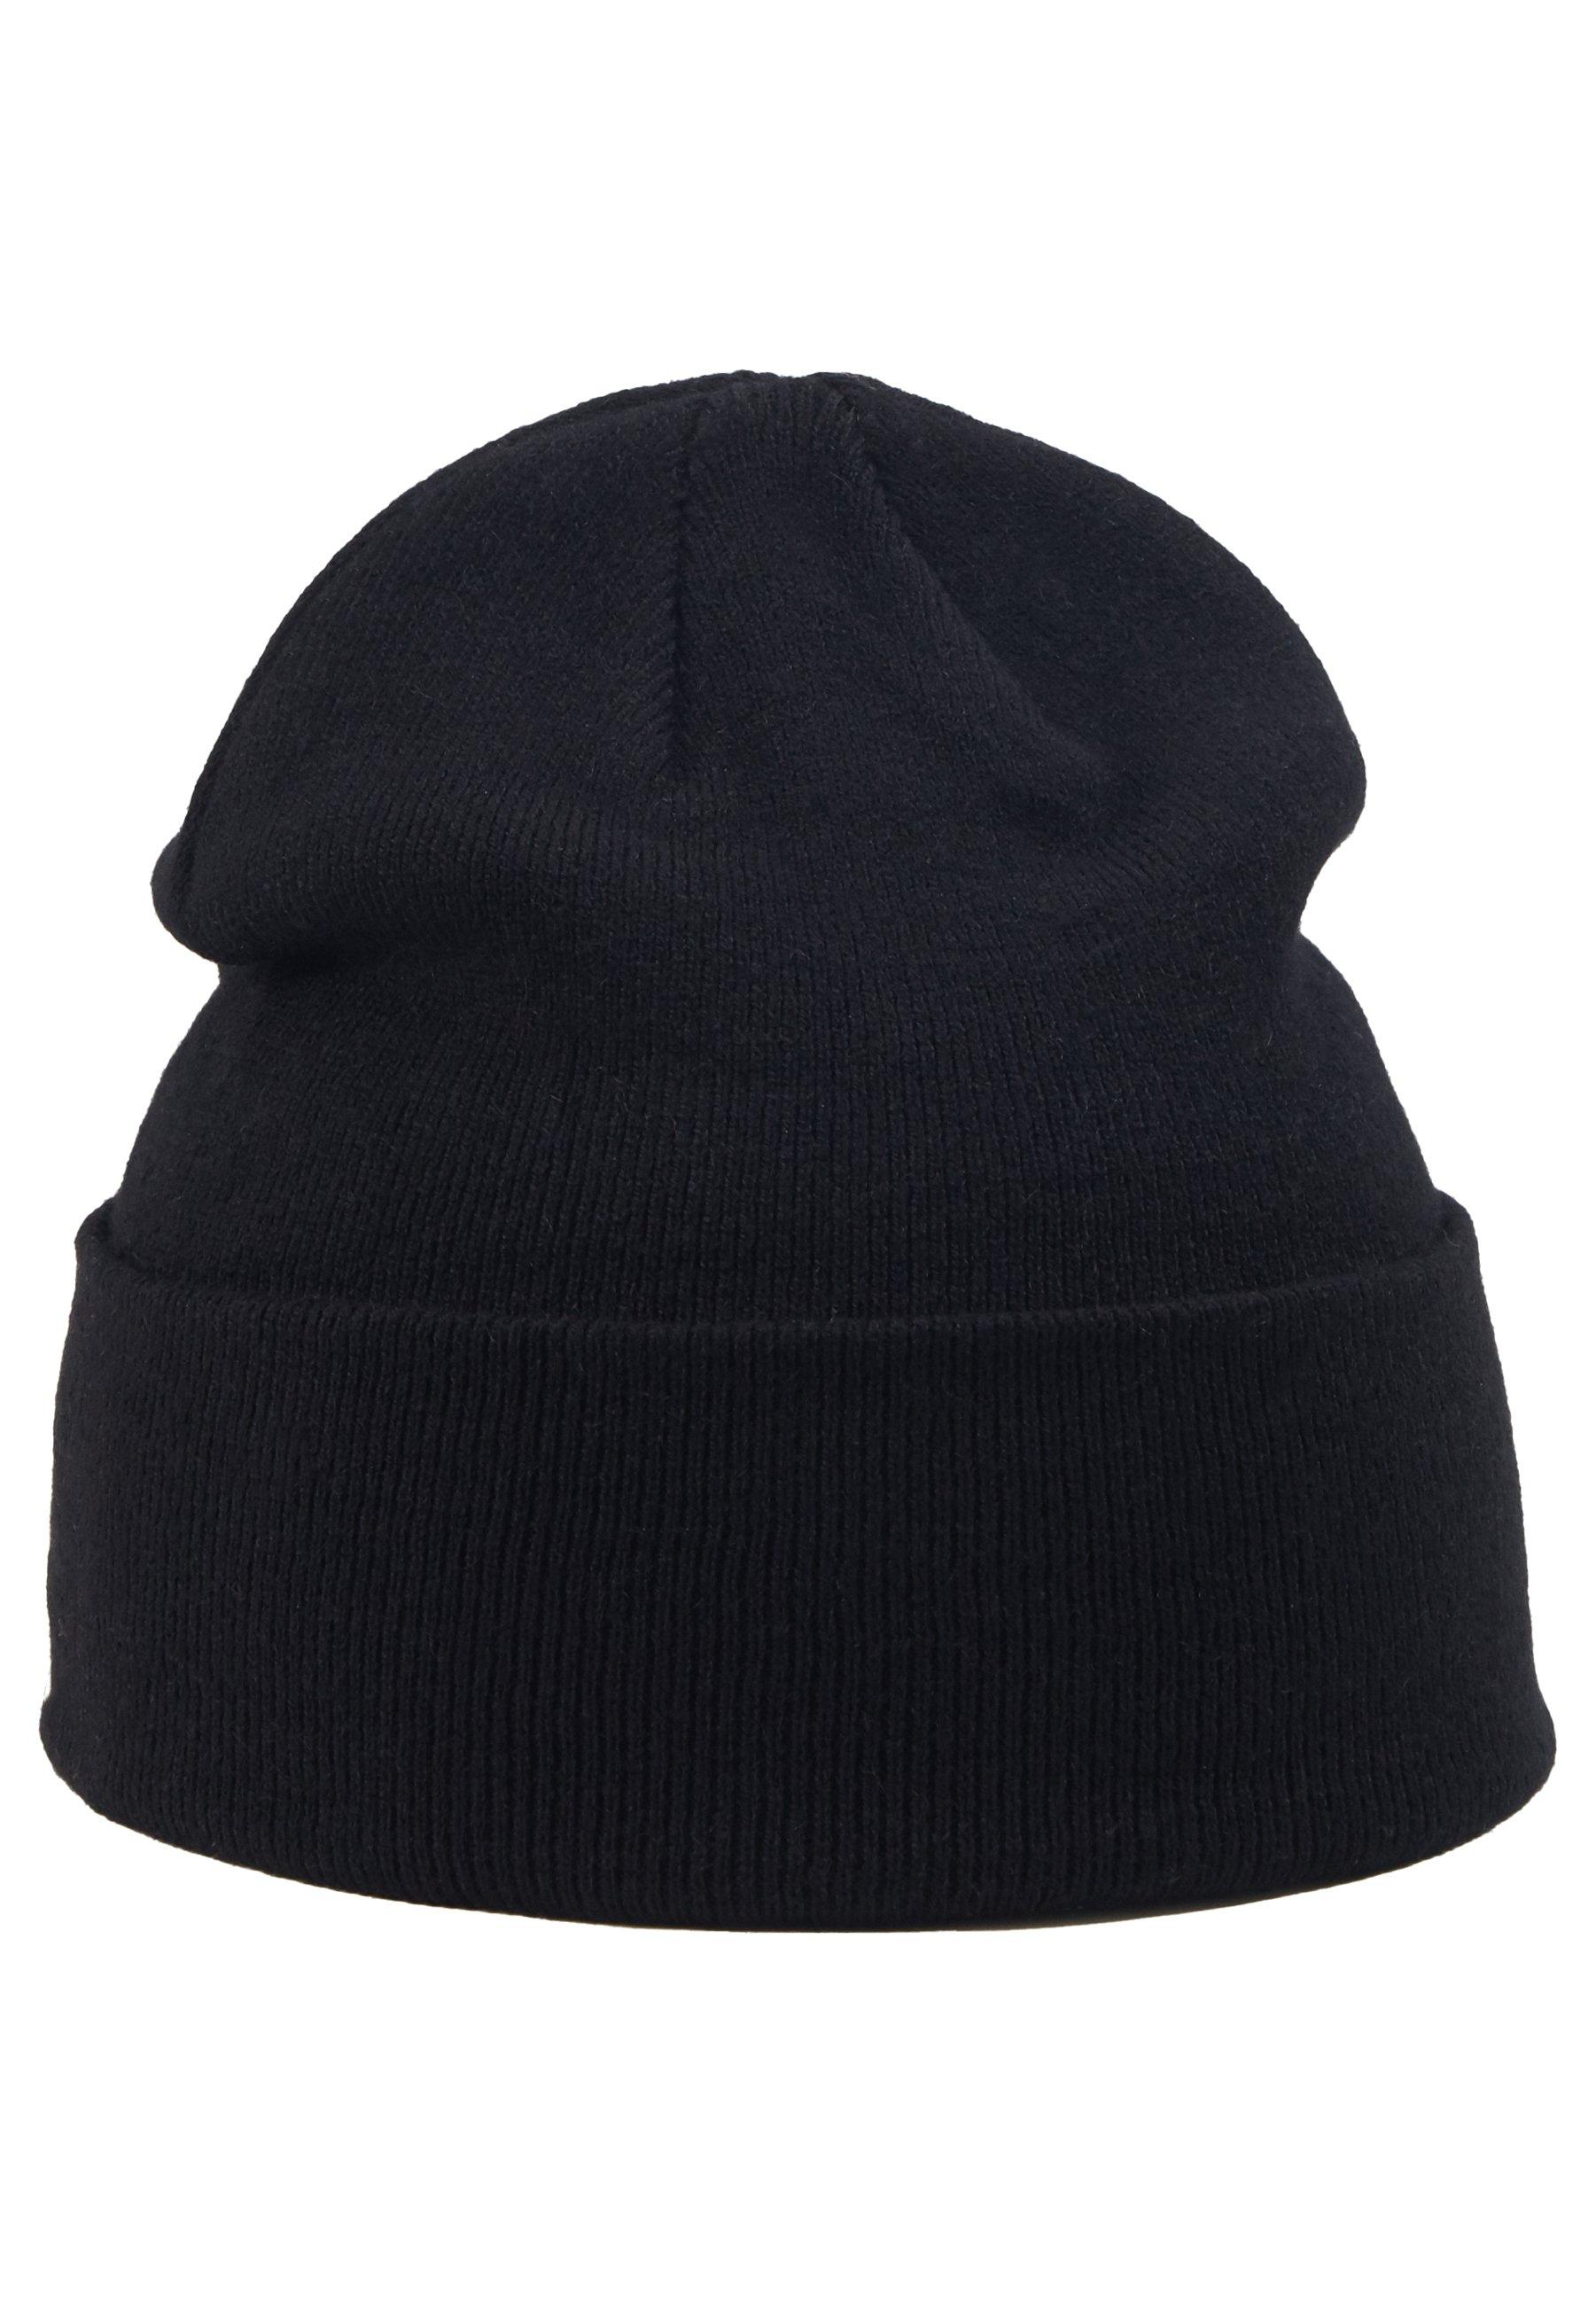 Pier One Mütze - Dark Gray/dunkelgrau